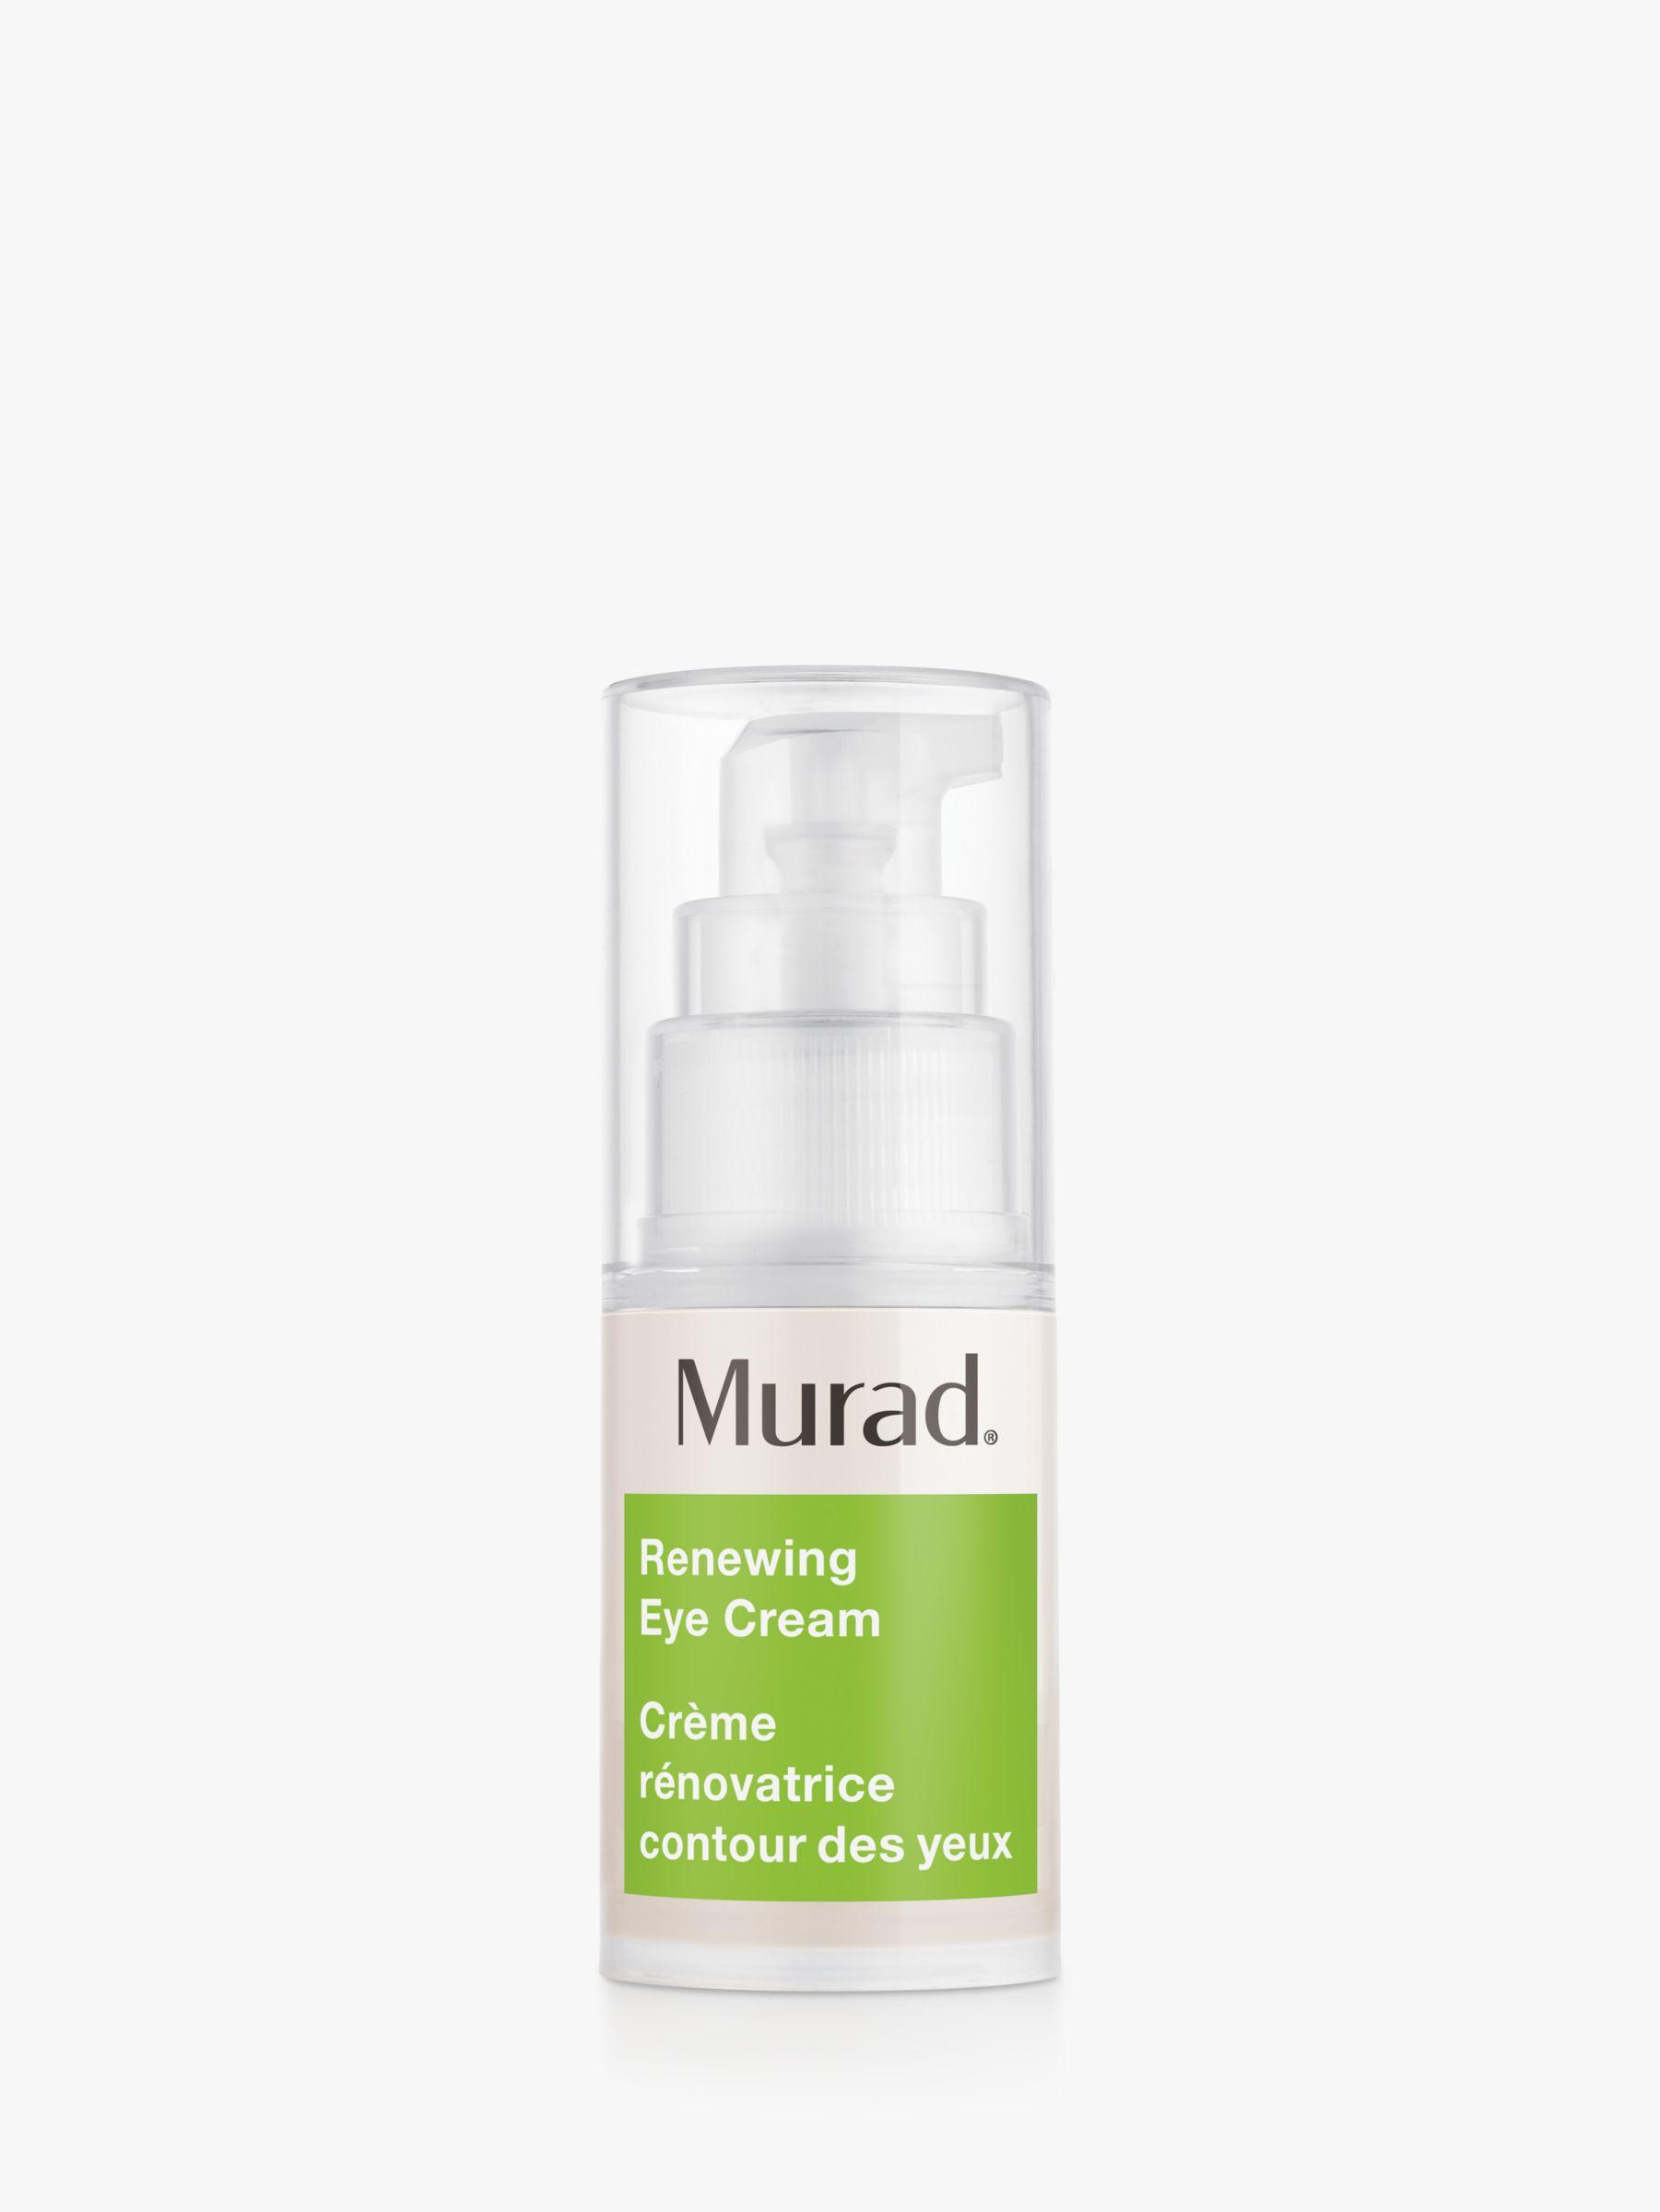 Murad Murad Renewing Eye Cream, 15ml